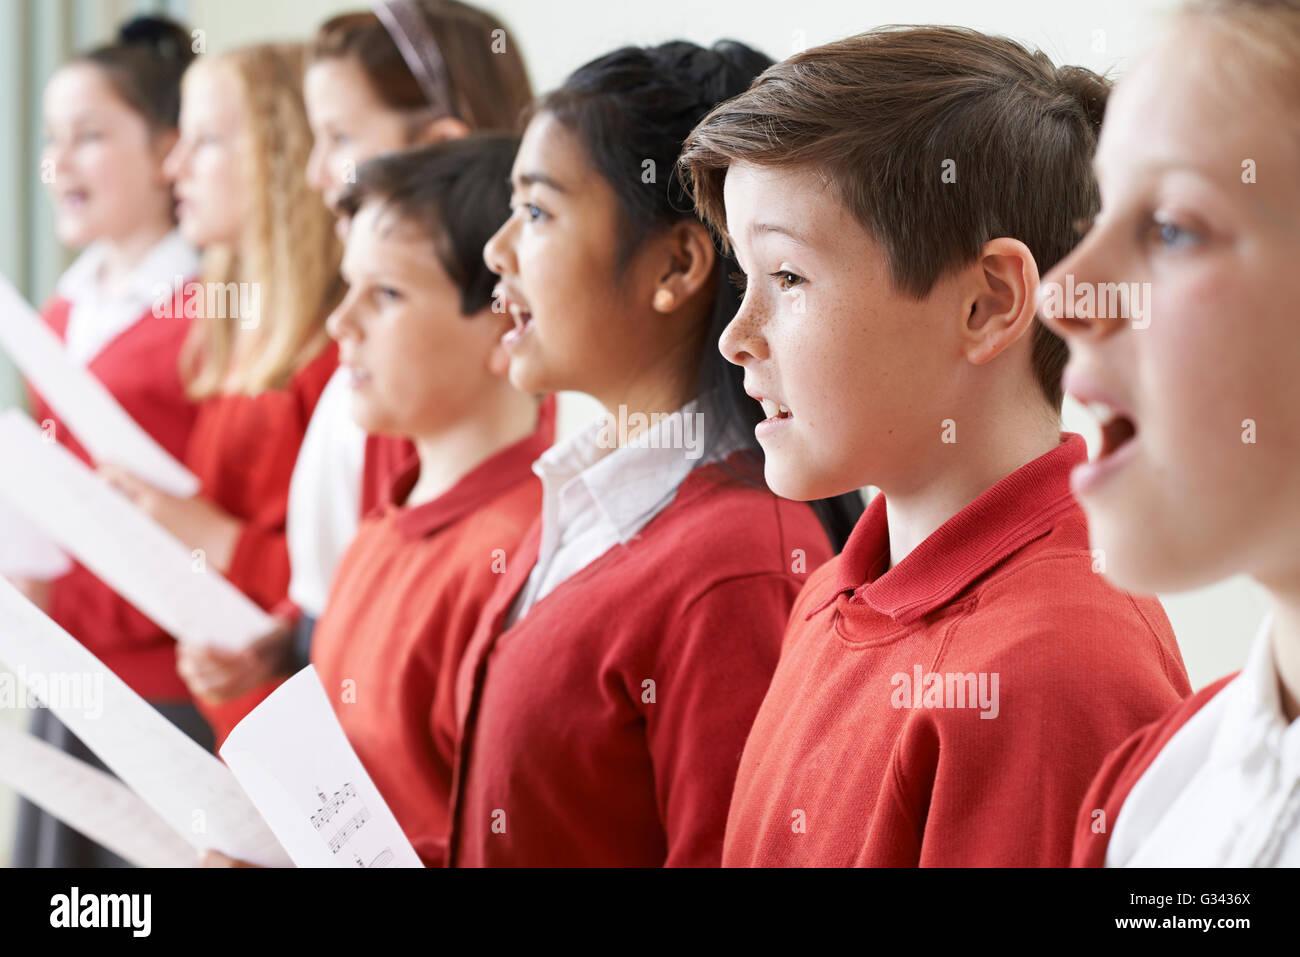 Group Of Children Singing In School Choir - Stock Image